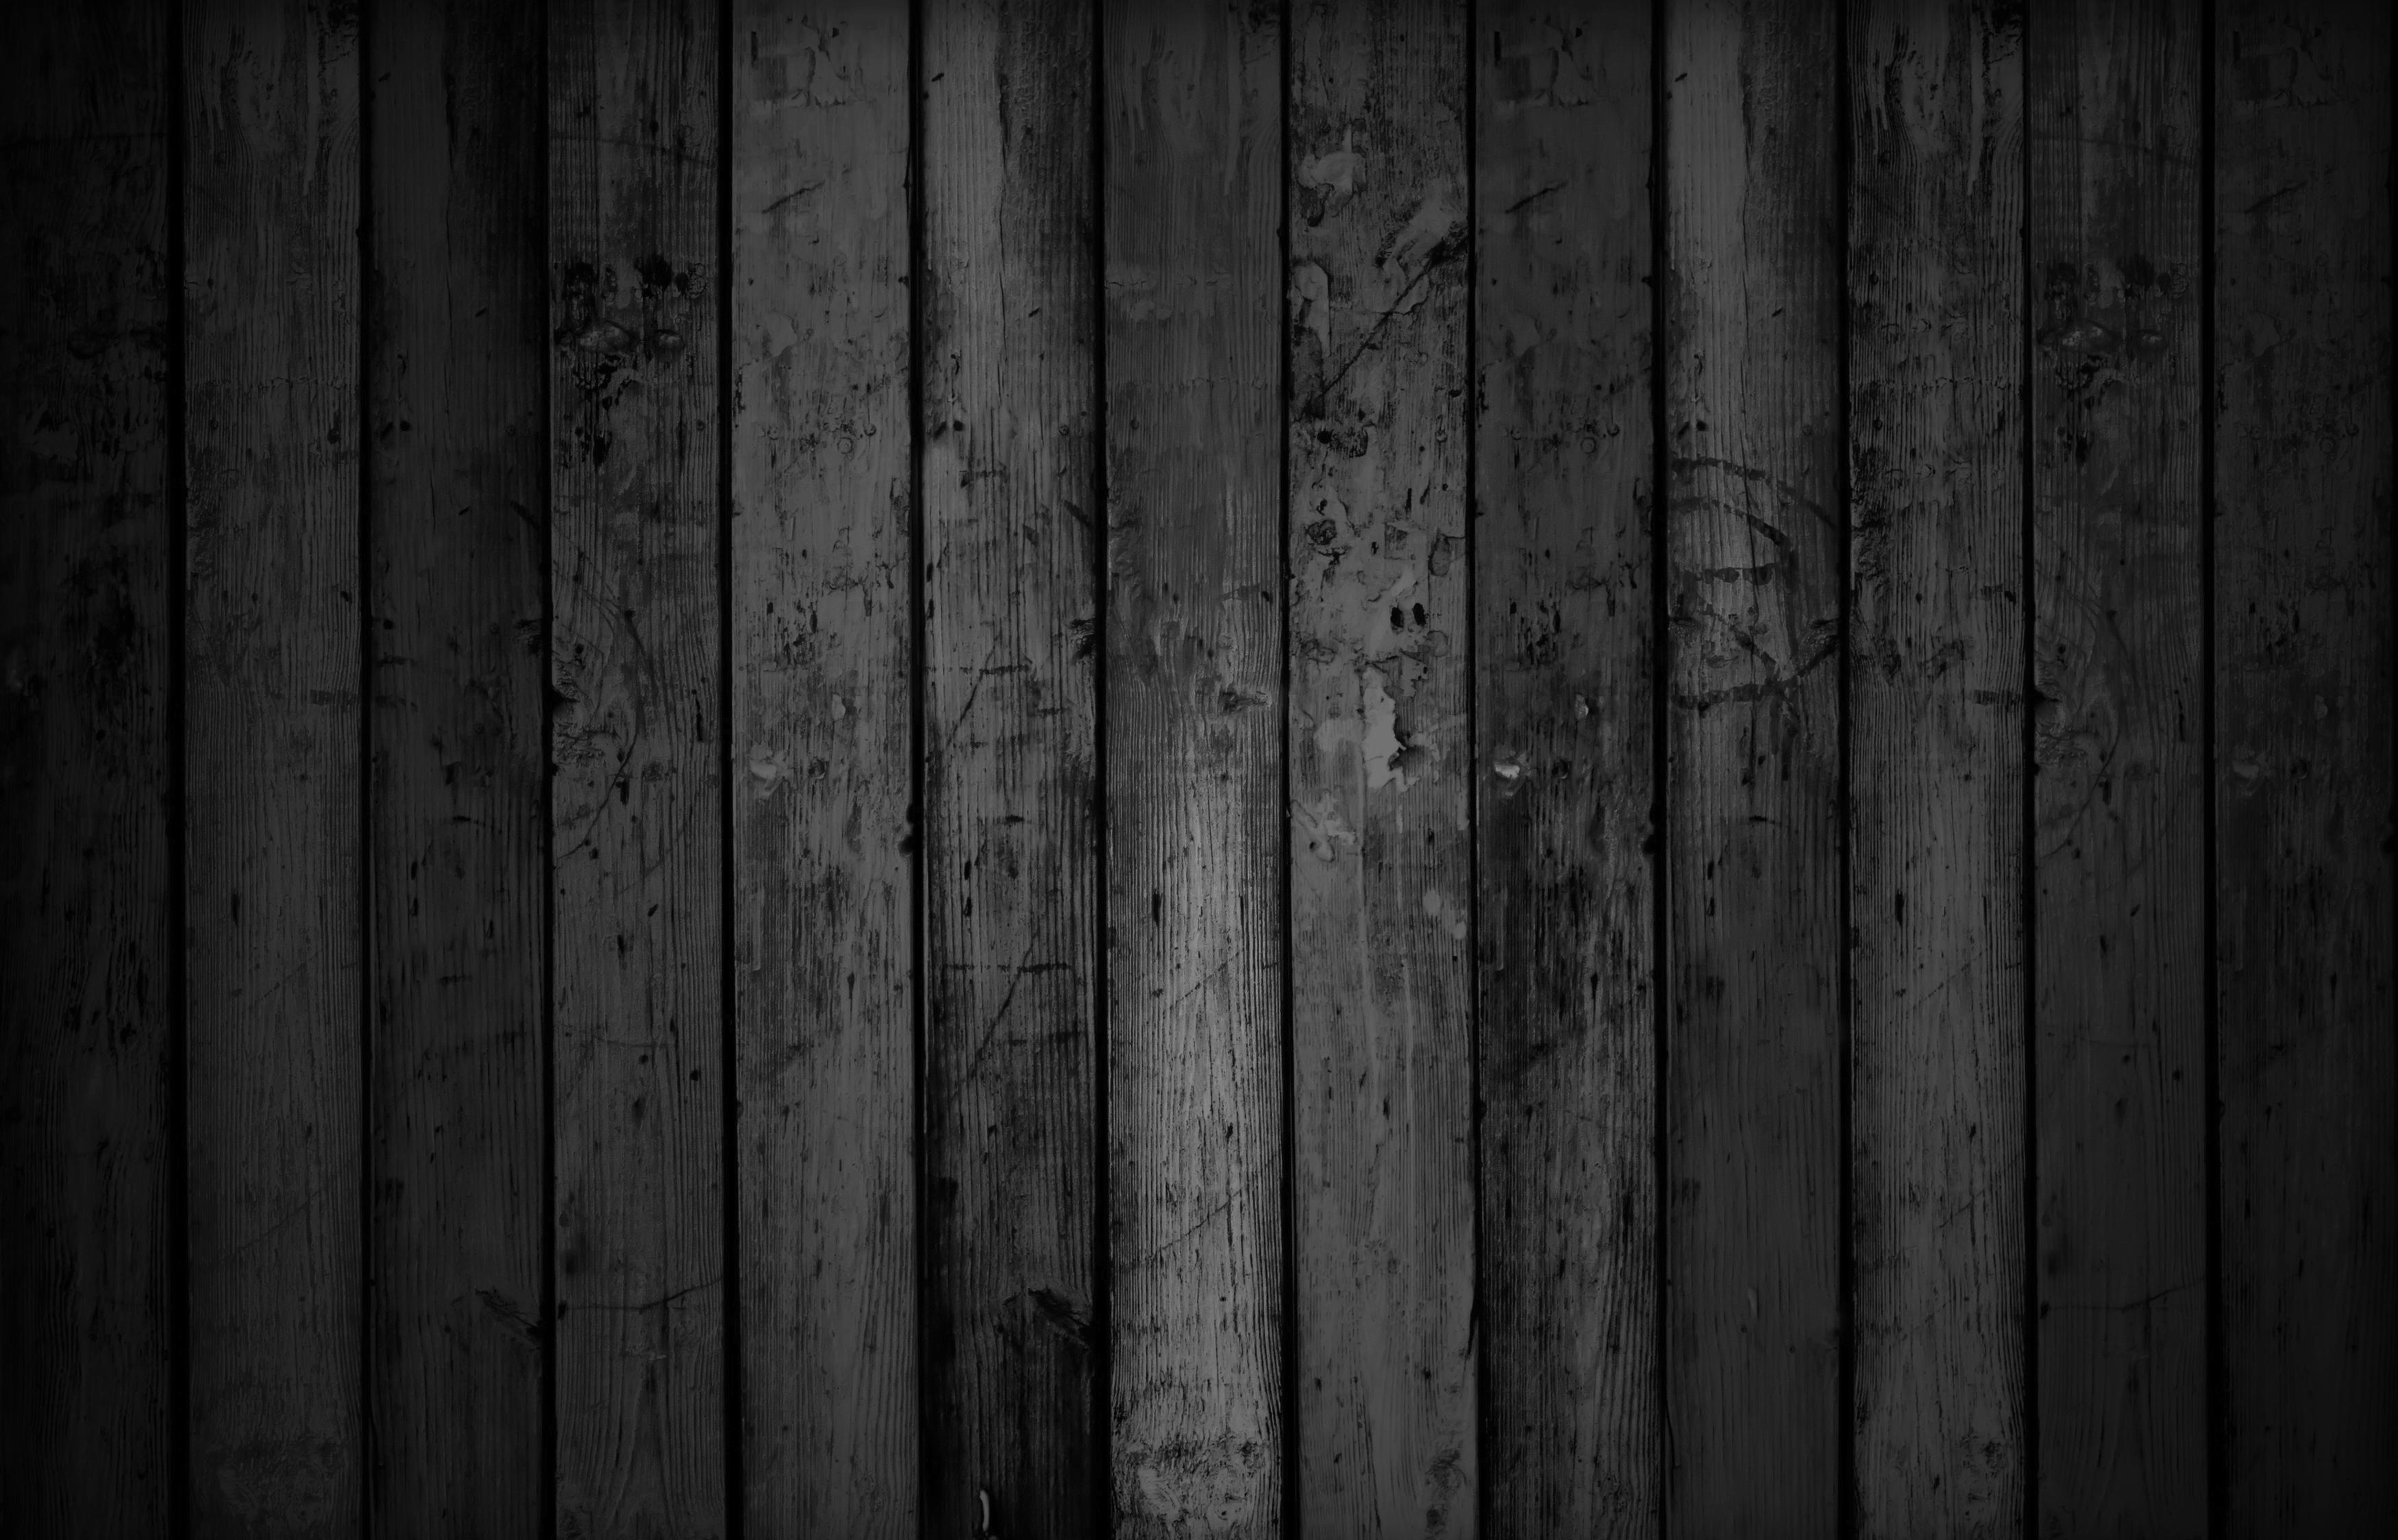 wood-background.jpg